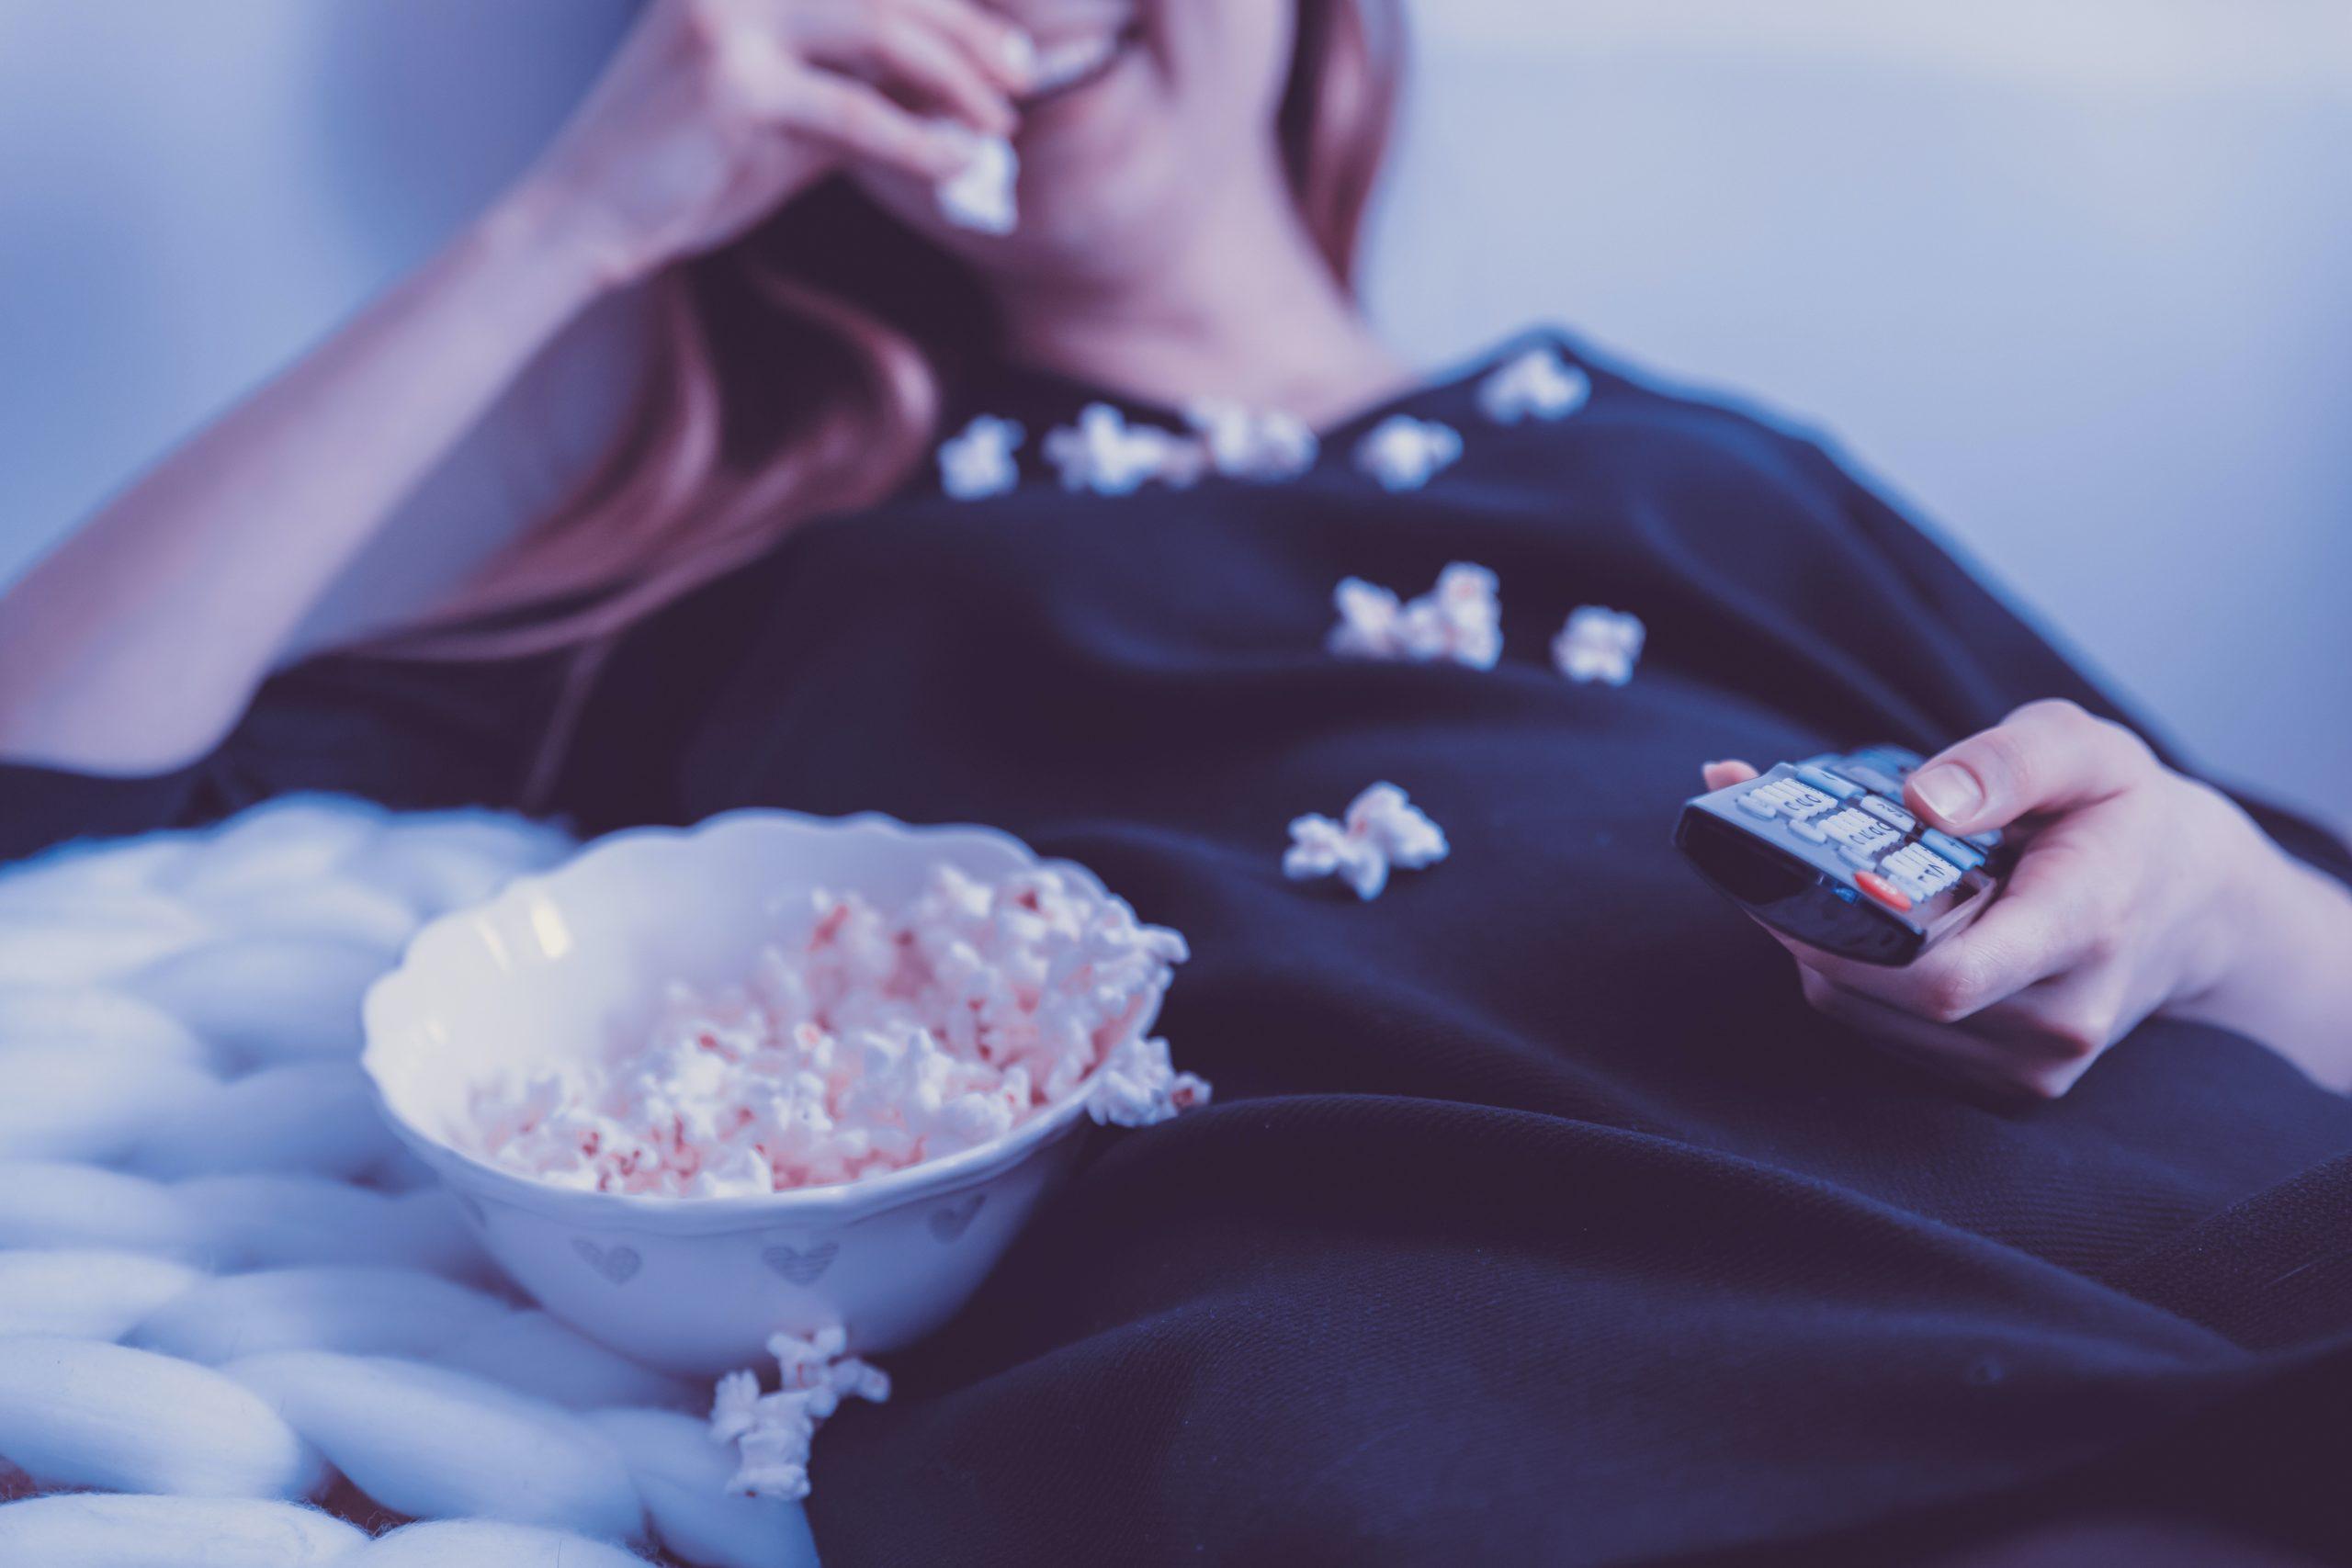 Bachelorette Party Ideas in Scottsdale: Movie Night